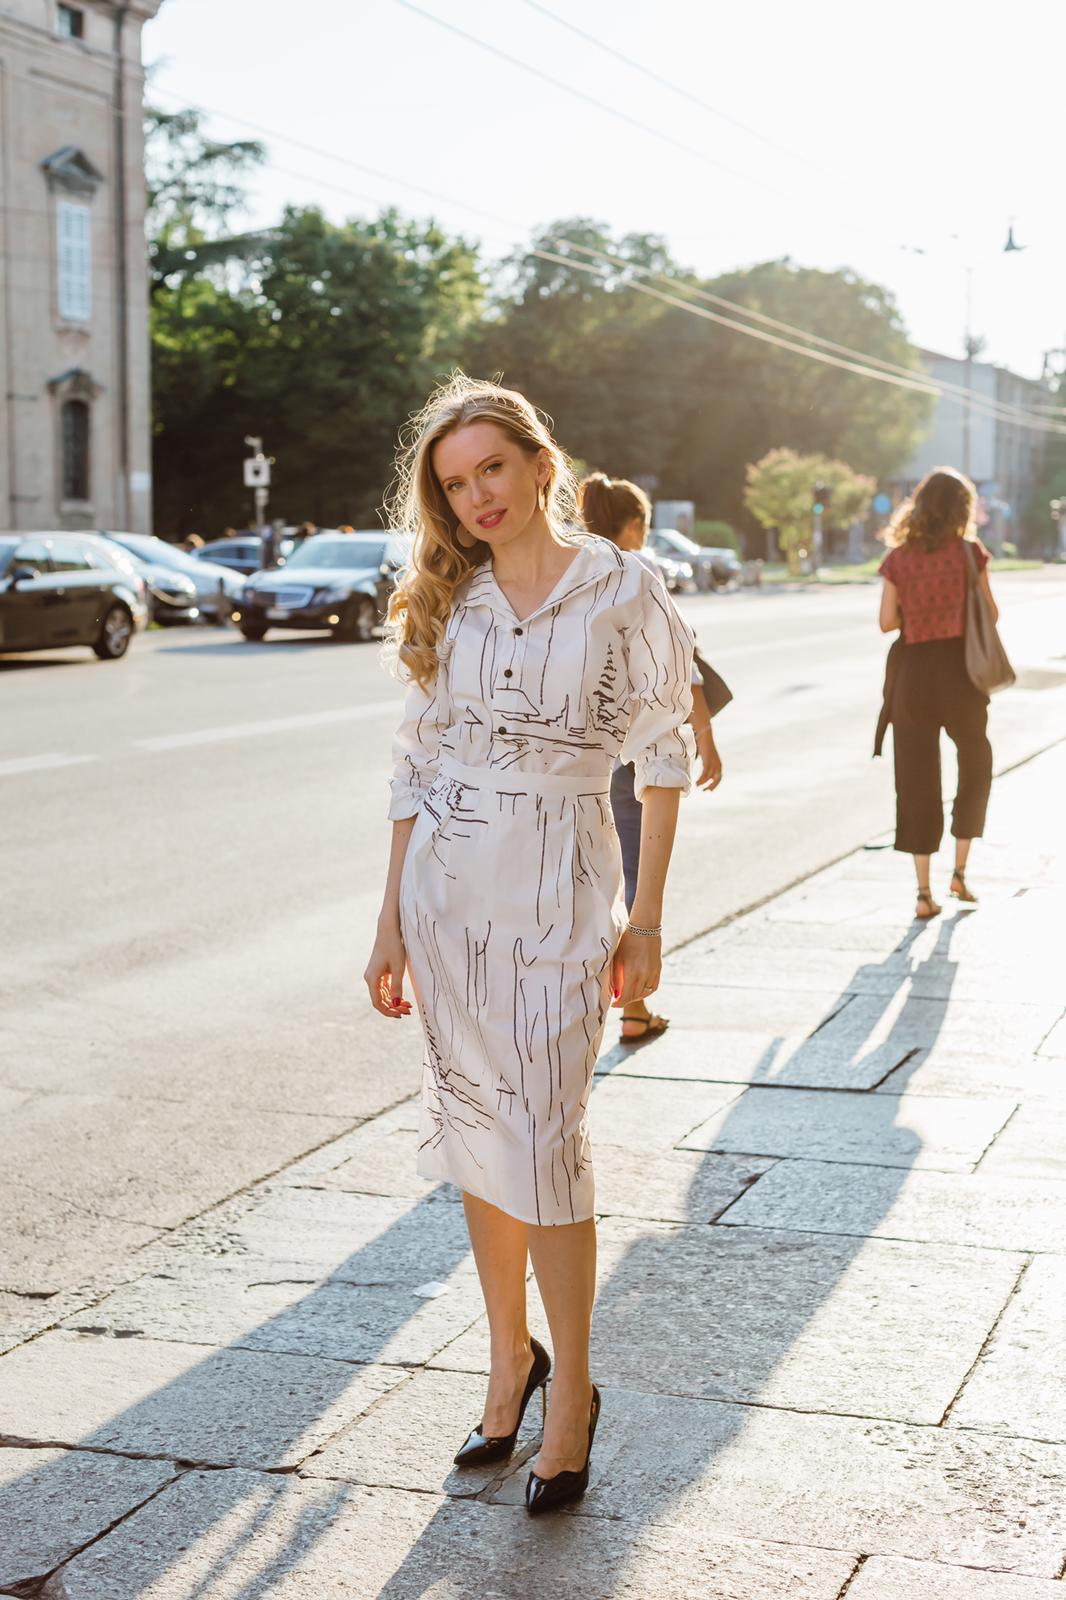 Roberta Organic Fashion Sophia Schneider Esleben Hemd Rock Snow 1